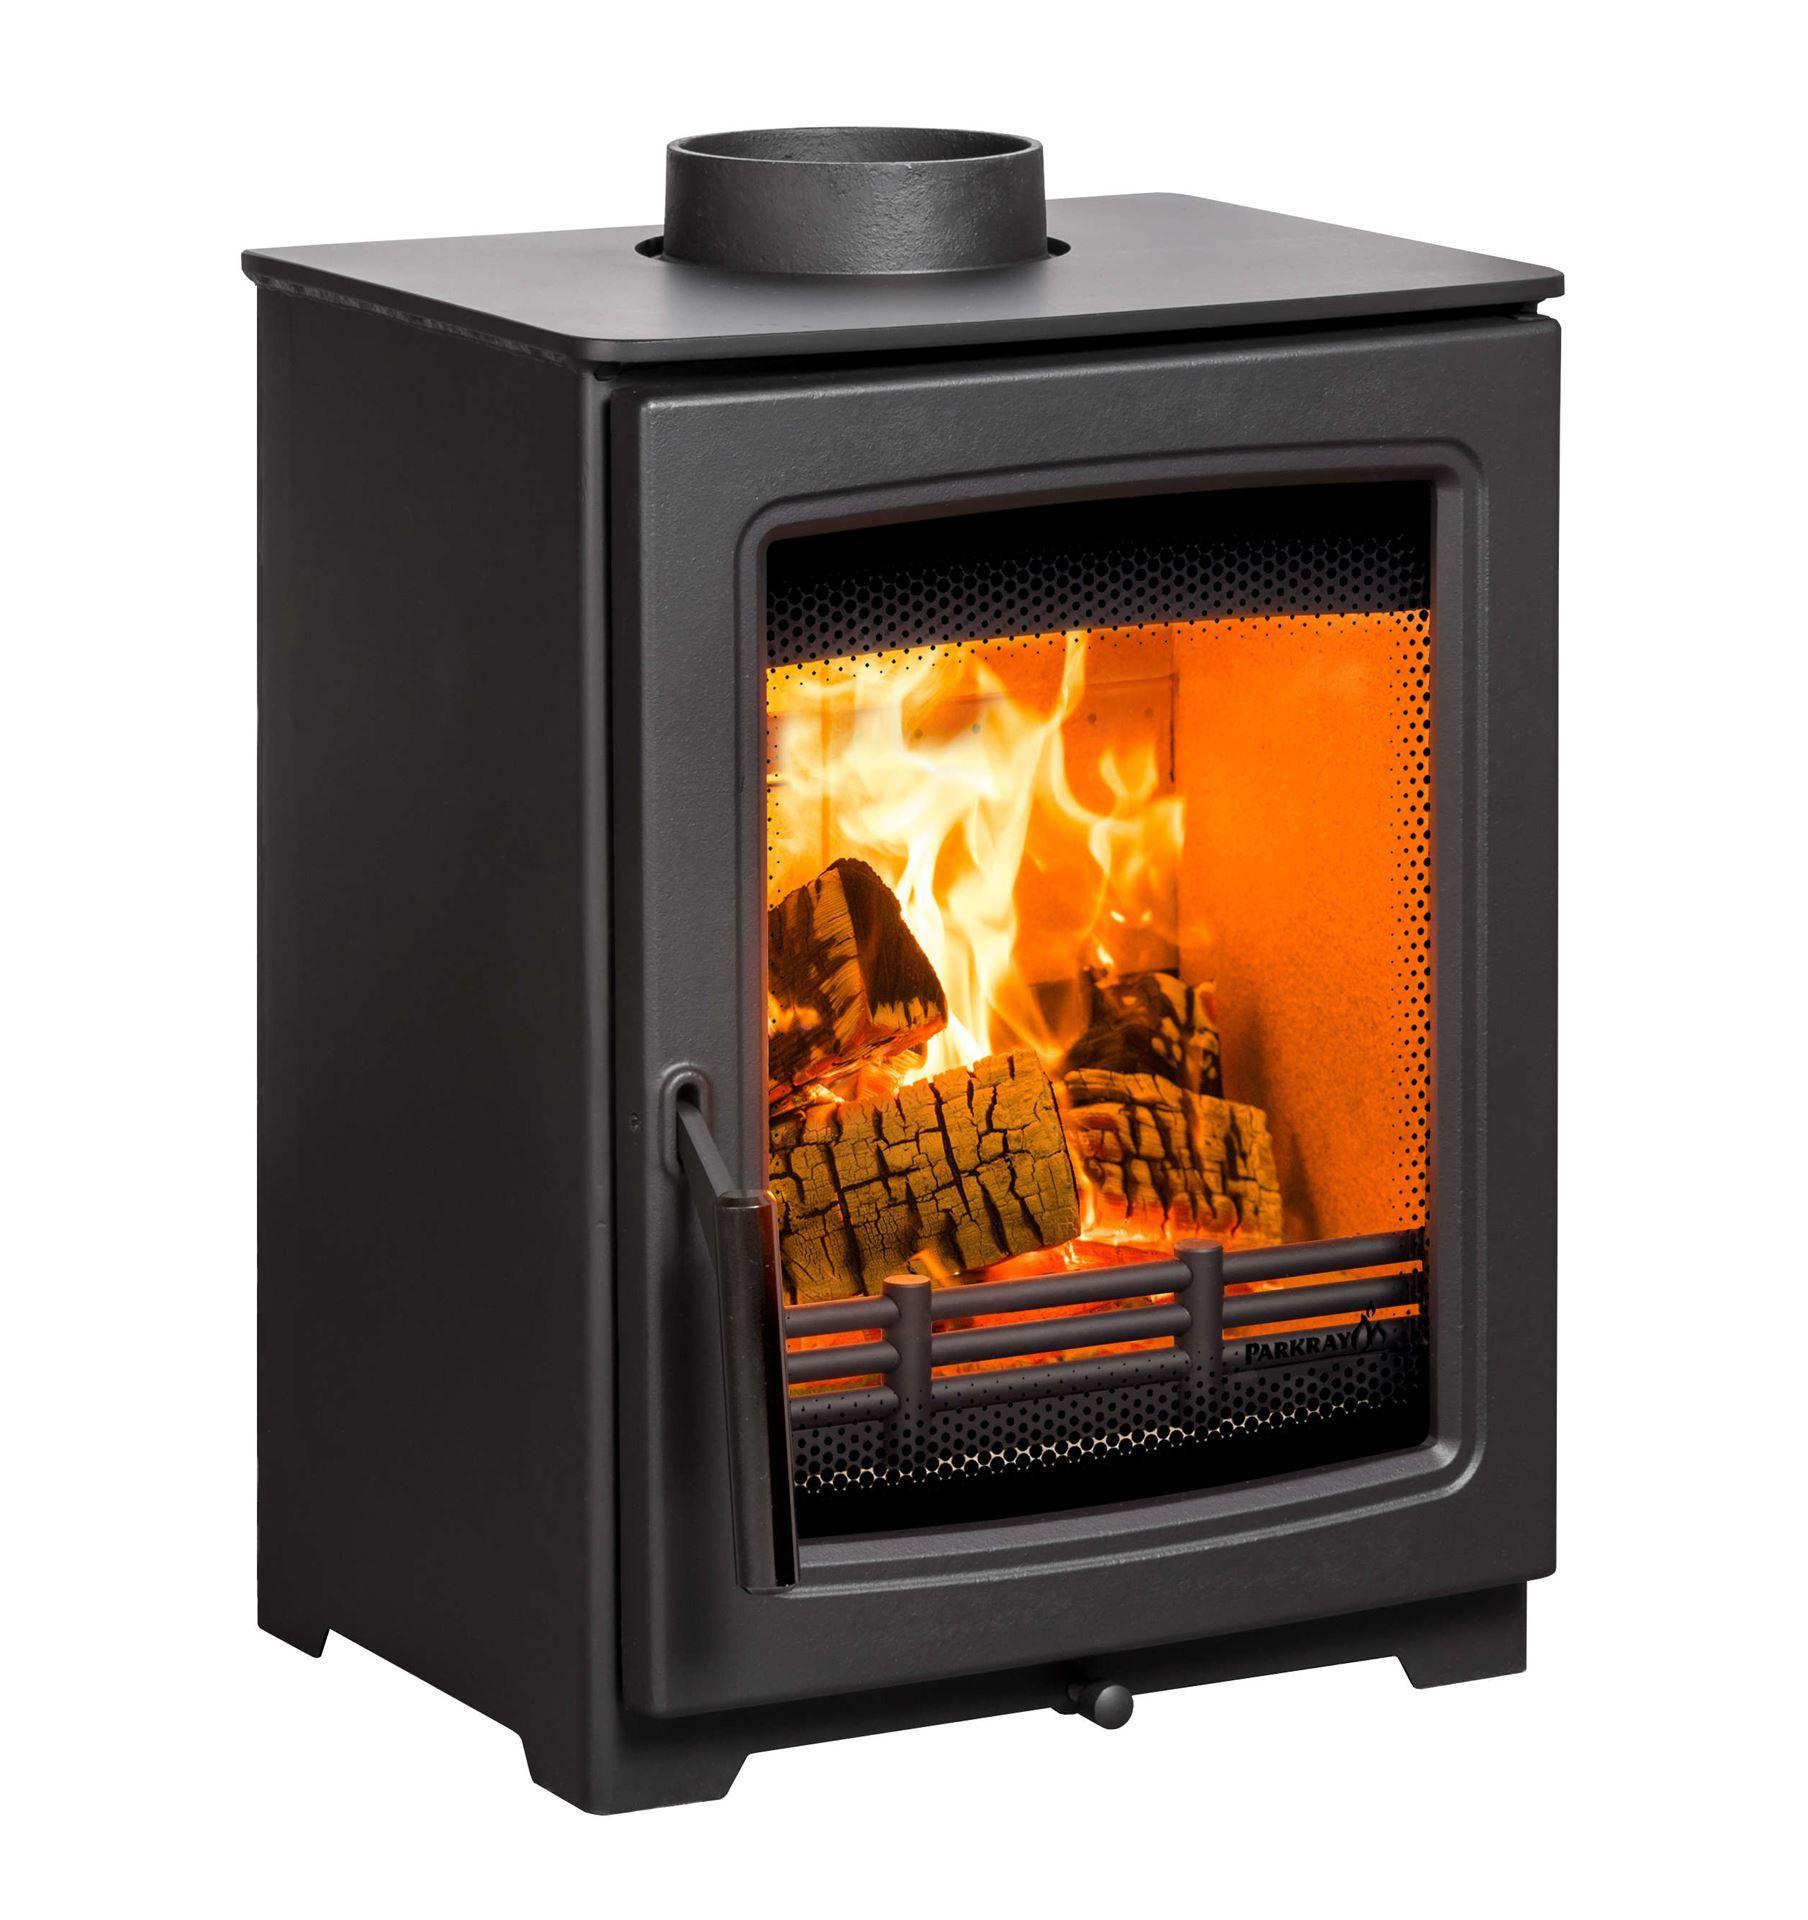 Parkray Aspect 4 Compact Wood Burning Stove Leeds Stove